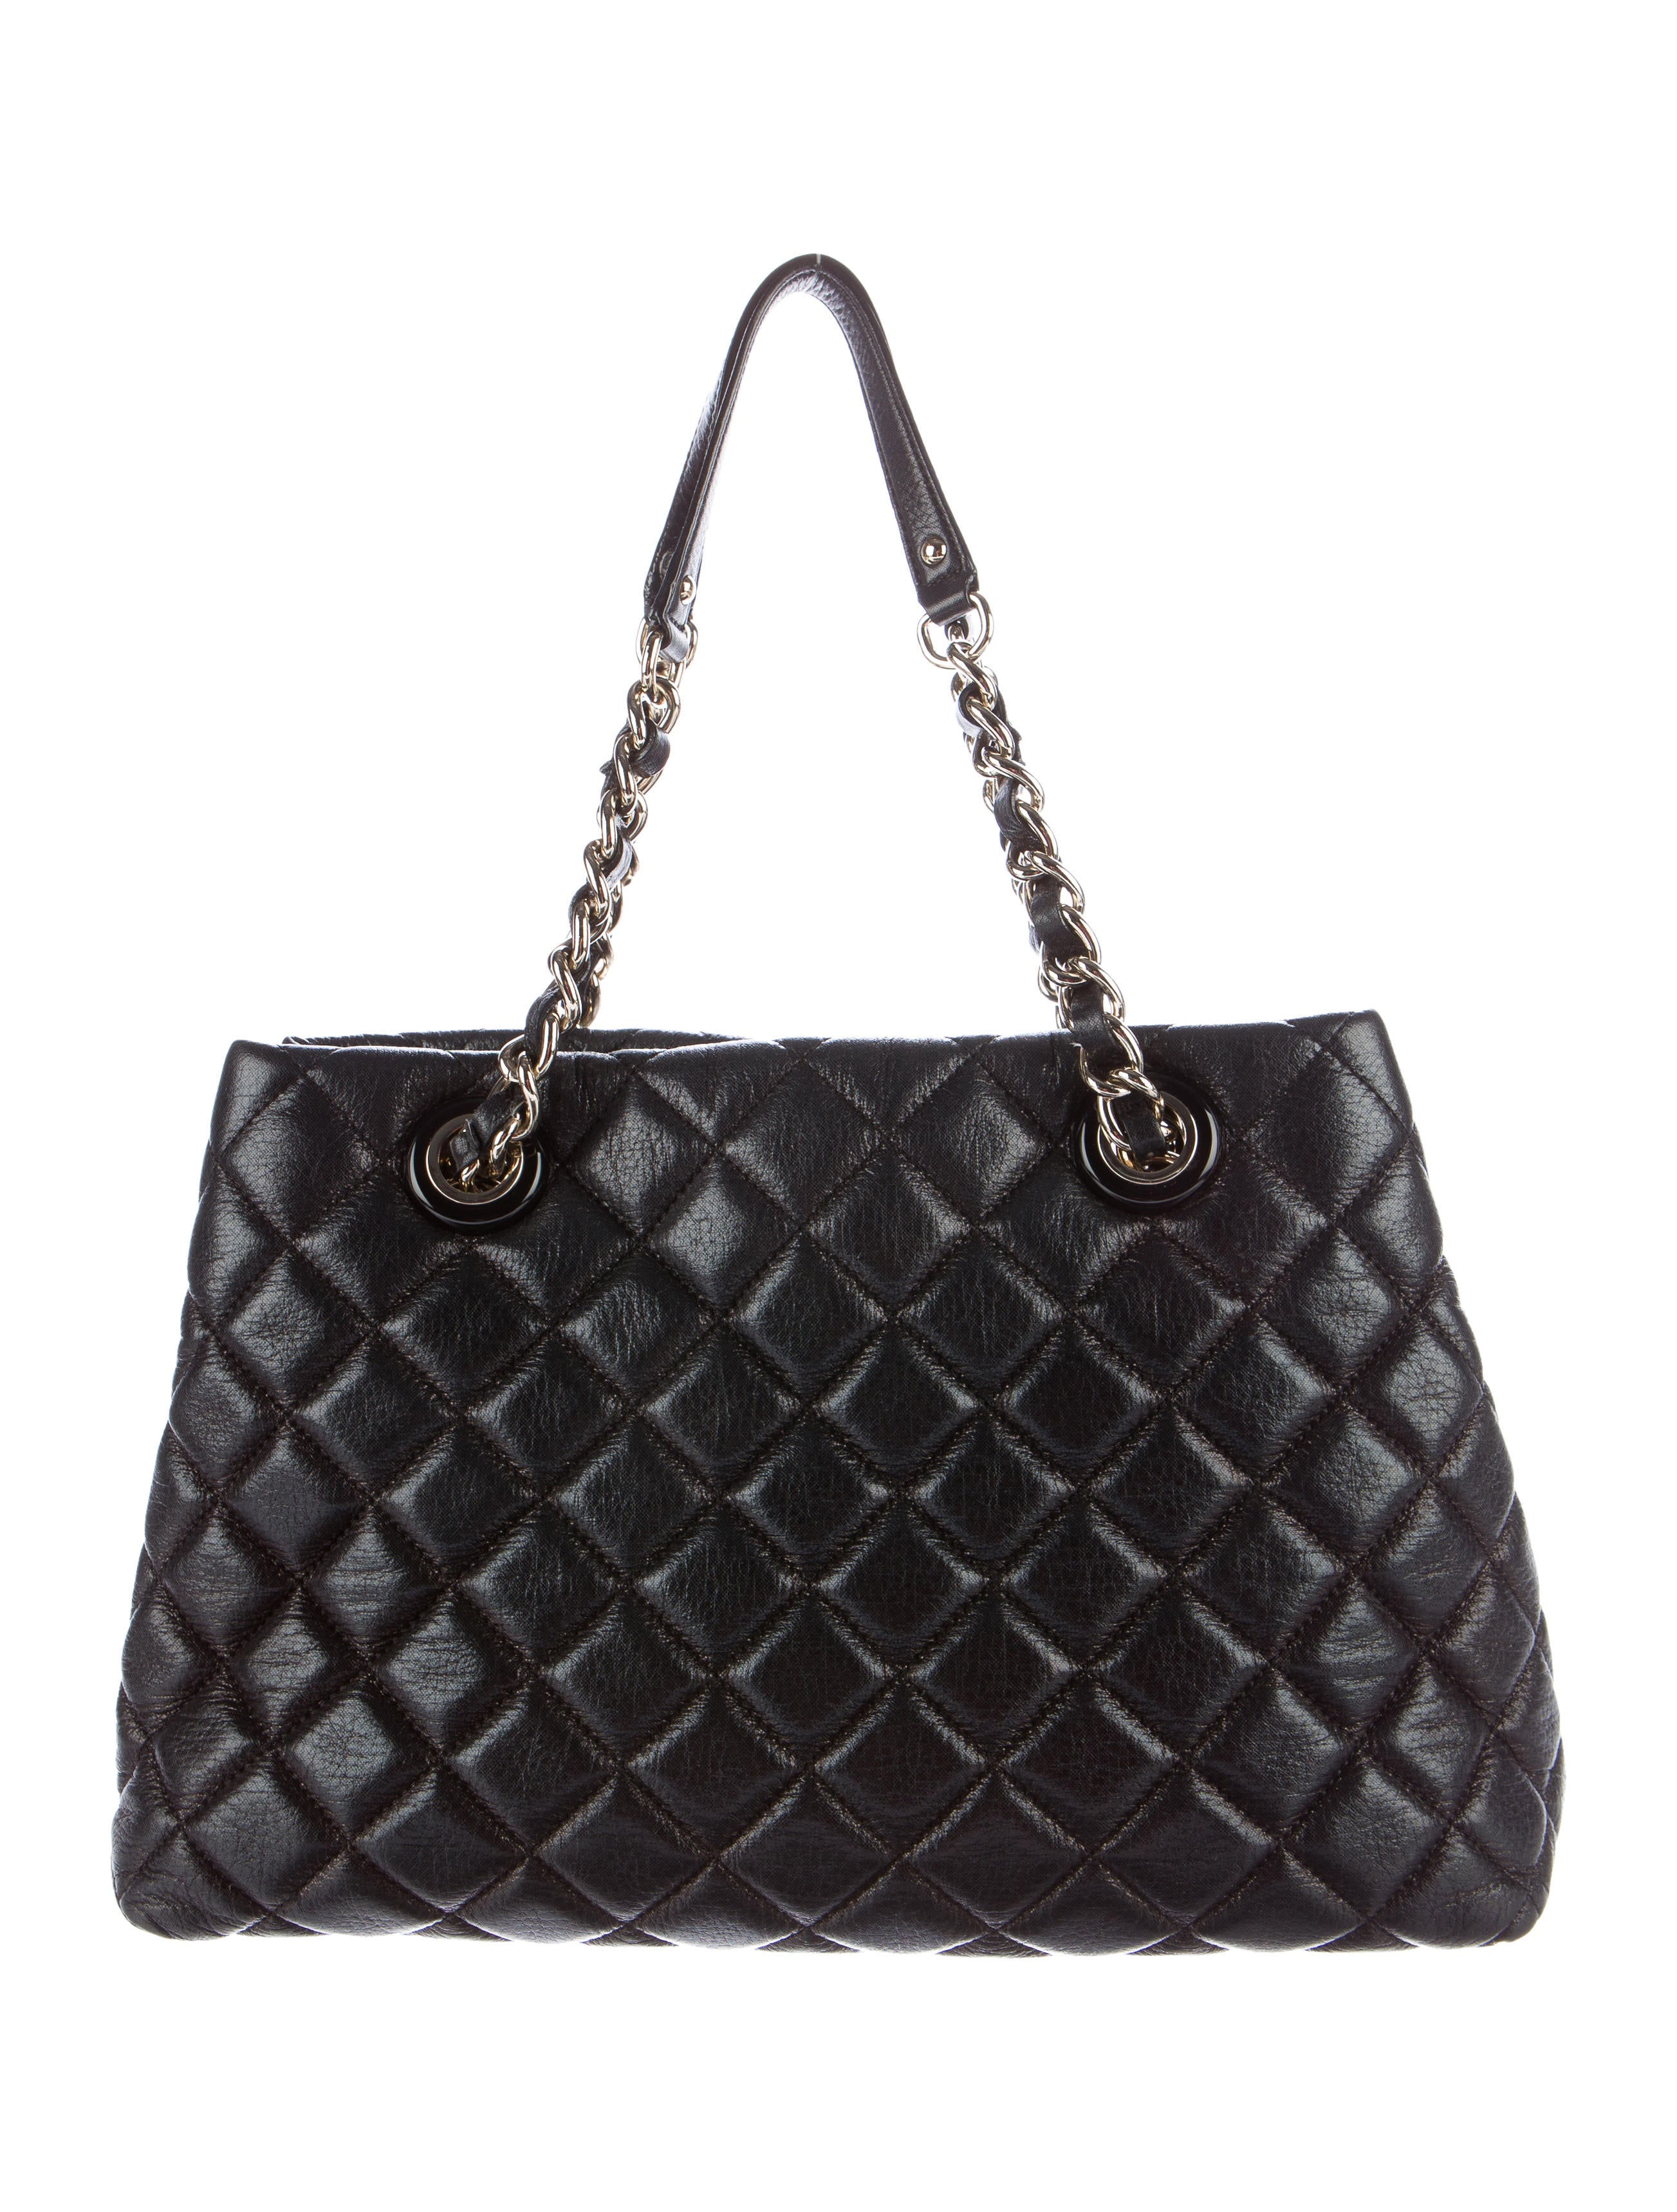 Kate Spade New York Gold Coast Maryanne Bag Handbags  : WKA546854enlarged from www.therealreal.com size 2606 x 3437 jpeg 729kB